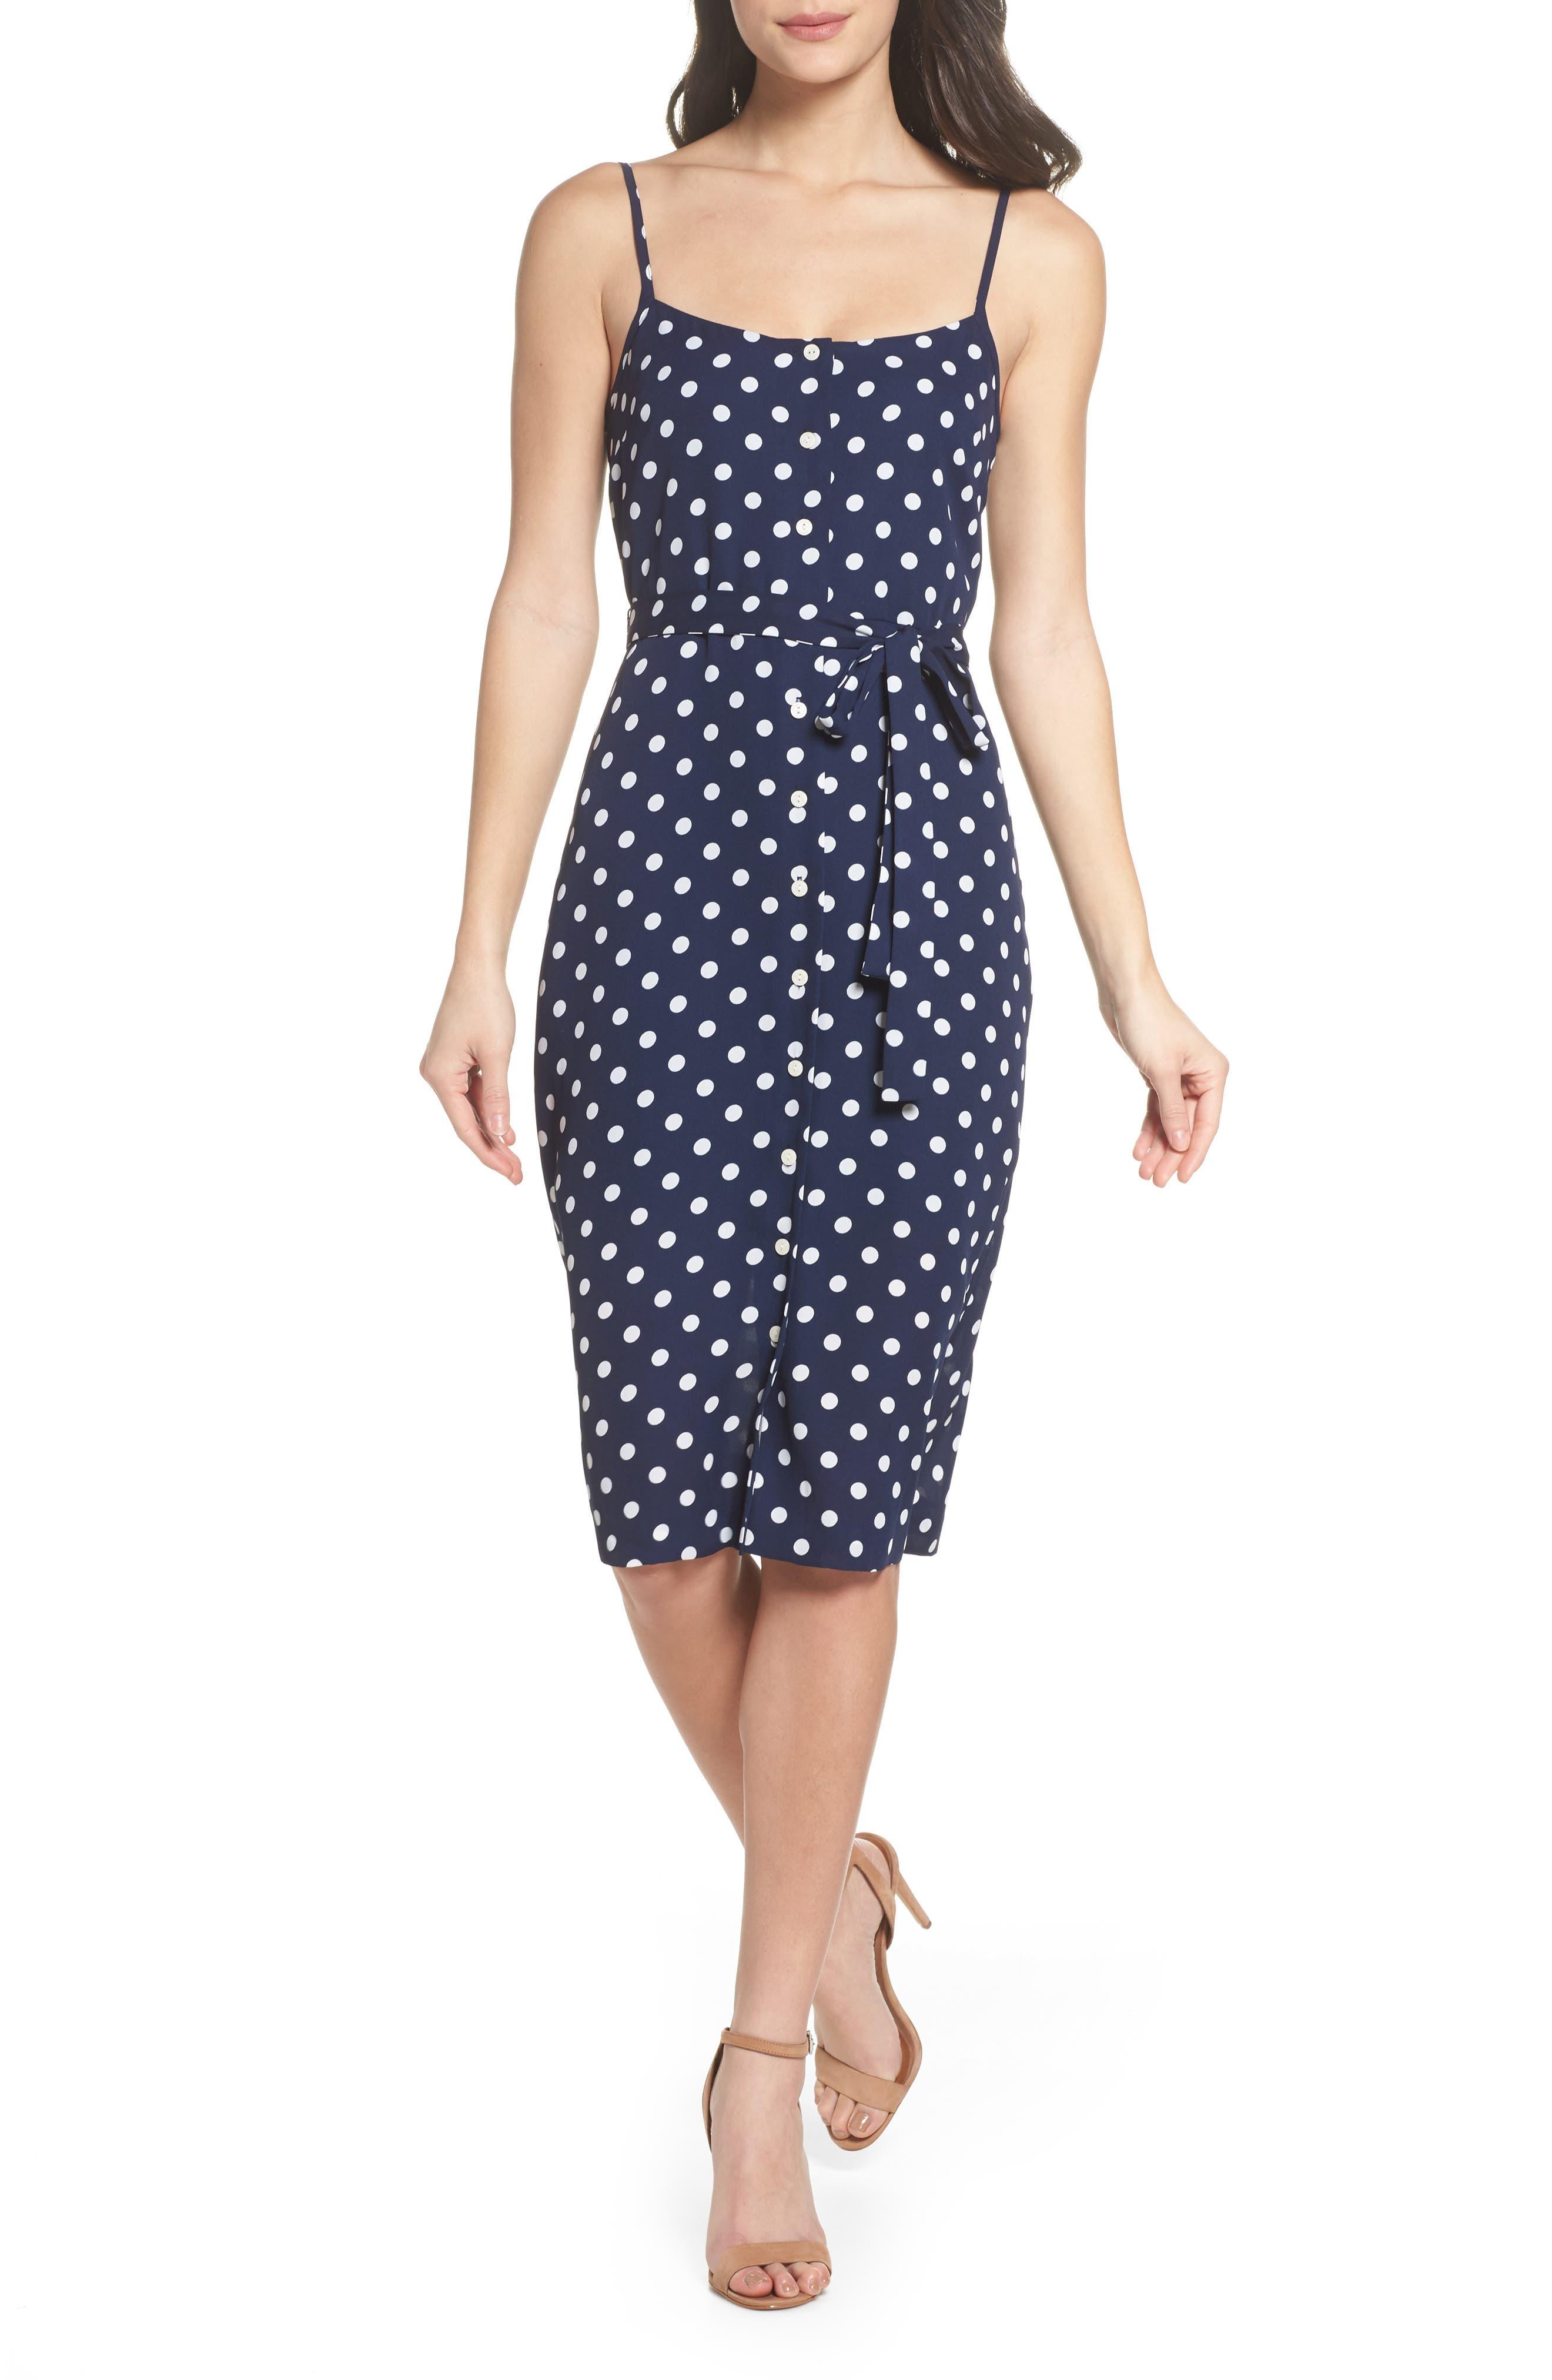 Flower Frolicking Midi Dress,                             Main thumbnail 1, color,                             Navy Polka Dot